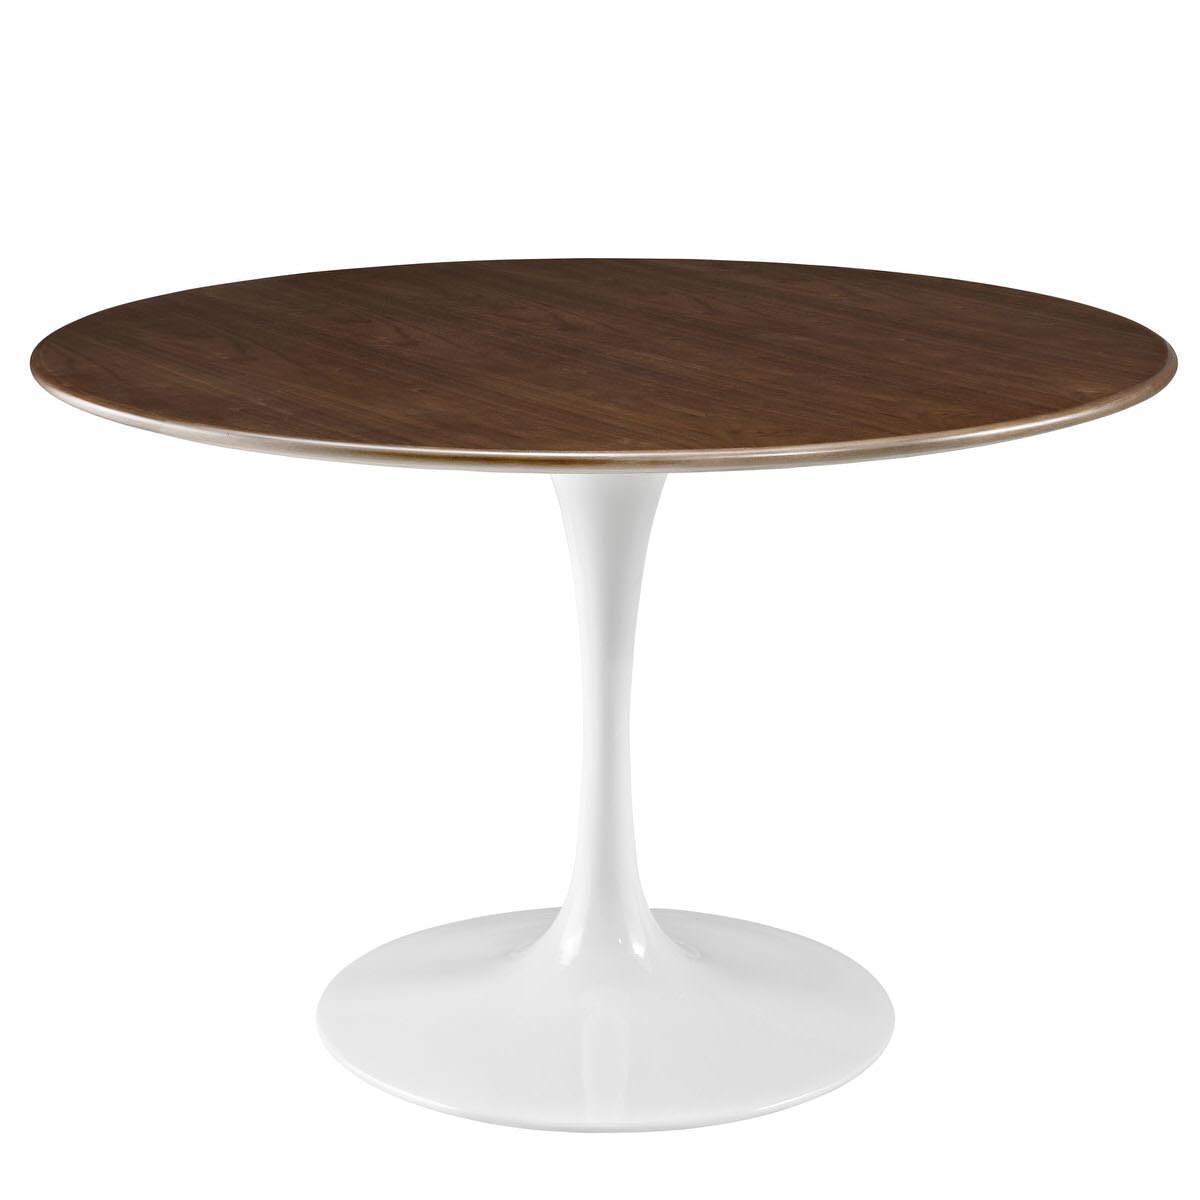 Lippa 47 Inch Round Walnut Dining Table By Modern Living